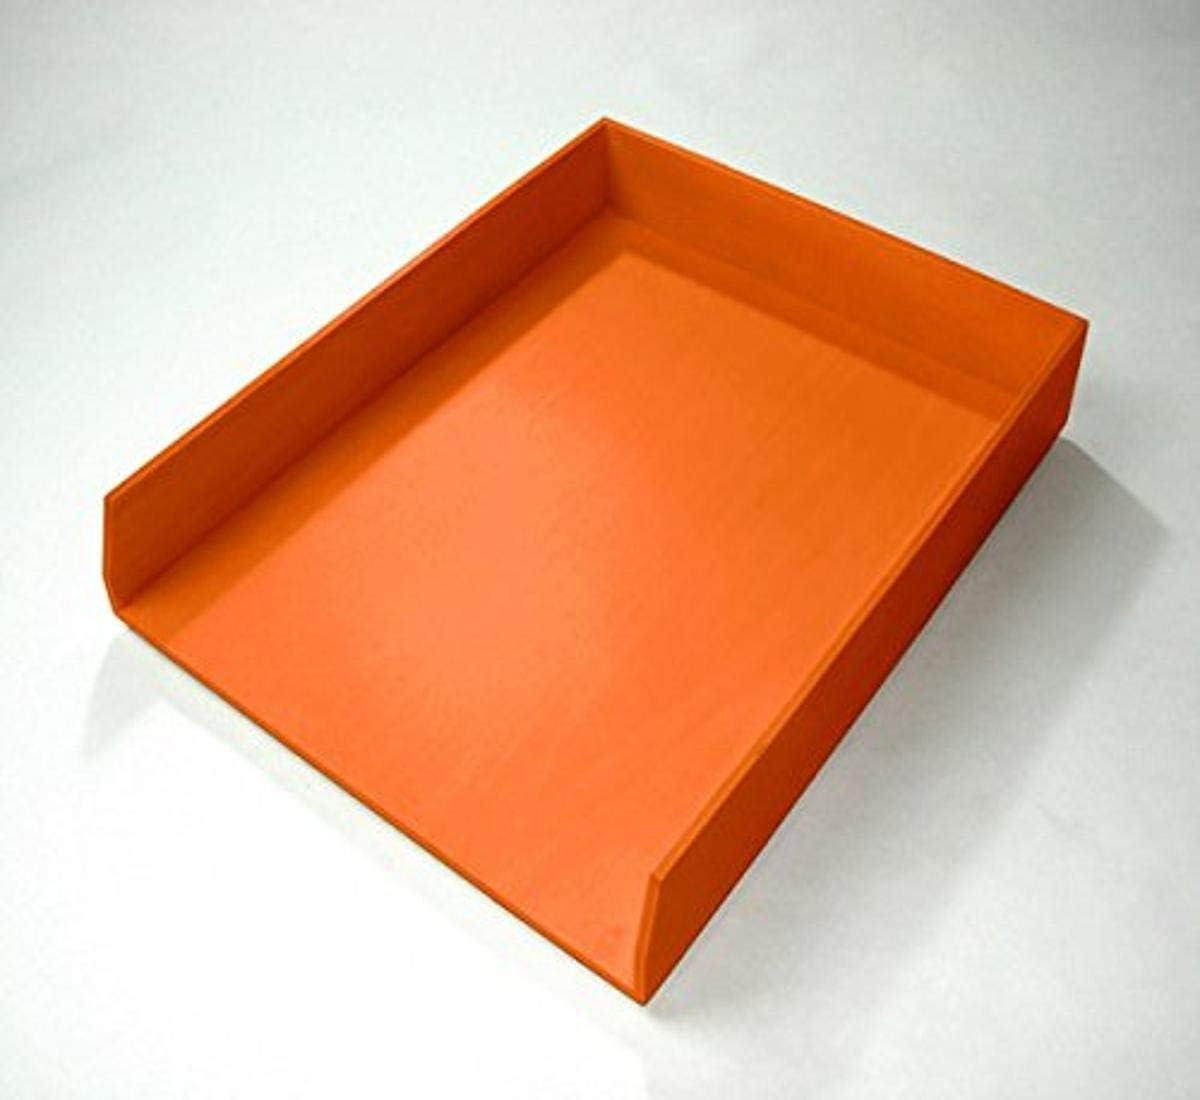 Bindertek Bright Mesa Mall Line Wooden Popular products Desk System Tray Letter Organizing